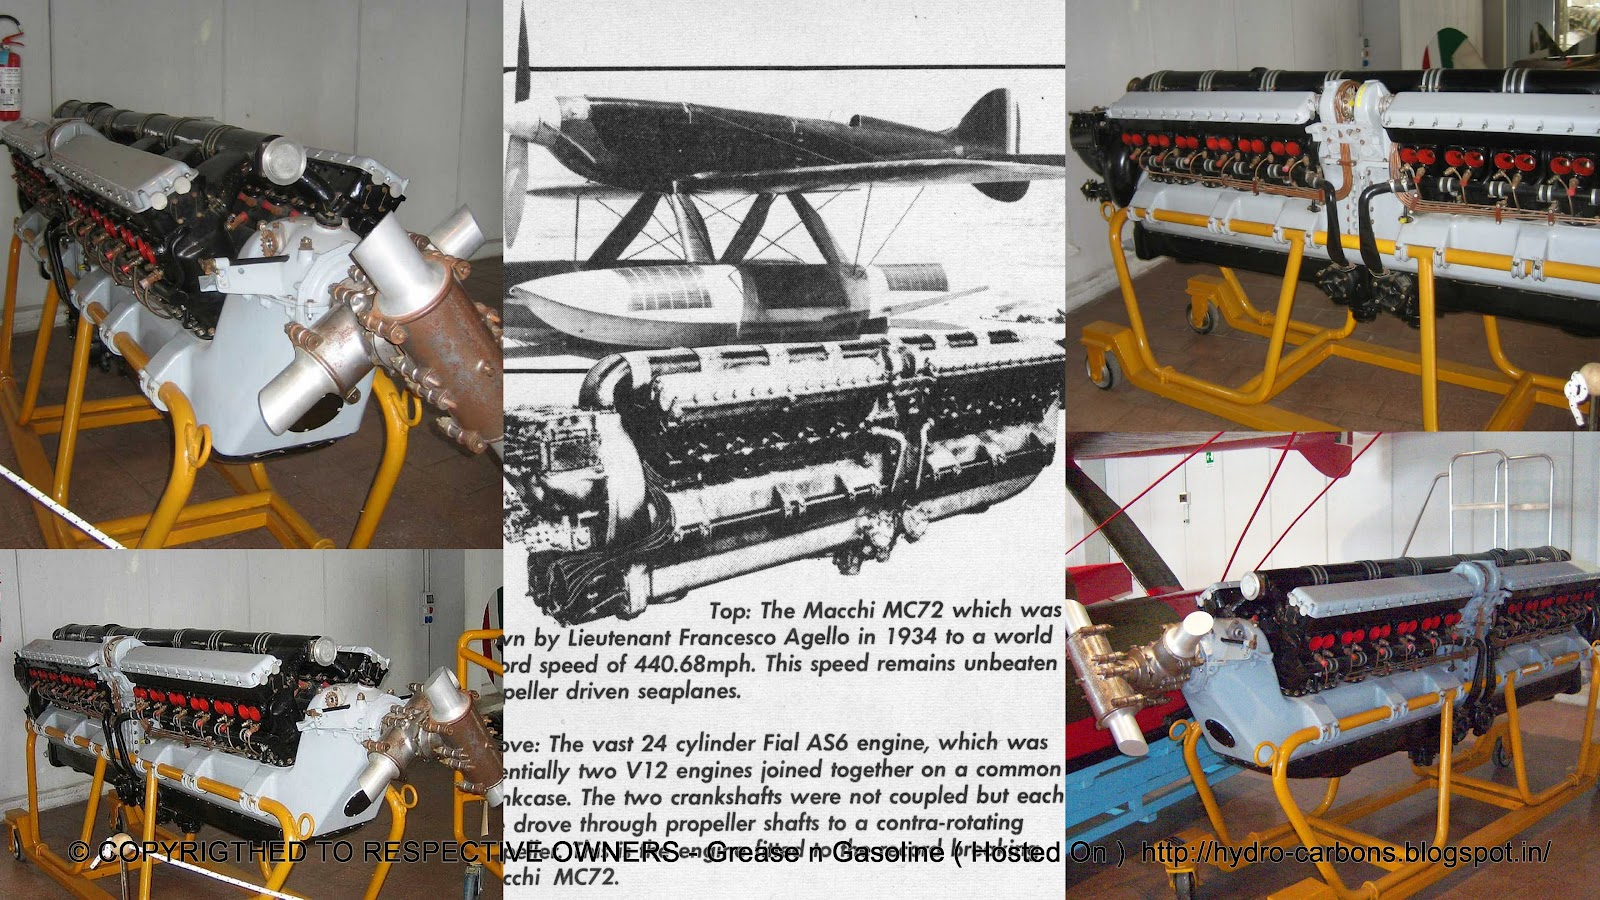 http://3.bp.blogspot.com/-S0-Fg6V2C7A/T8jHQFUE7qI/AAAAAAAAV5M/DJBYiVOK_HE/s1600/FIAT+-+V24+Engine++M.C.jpg